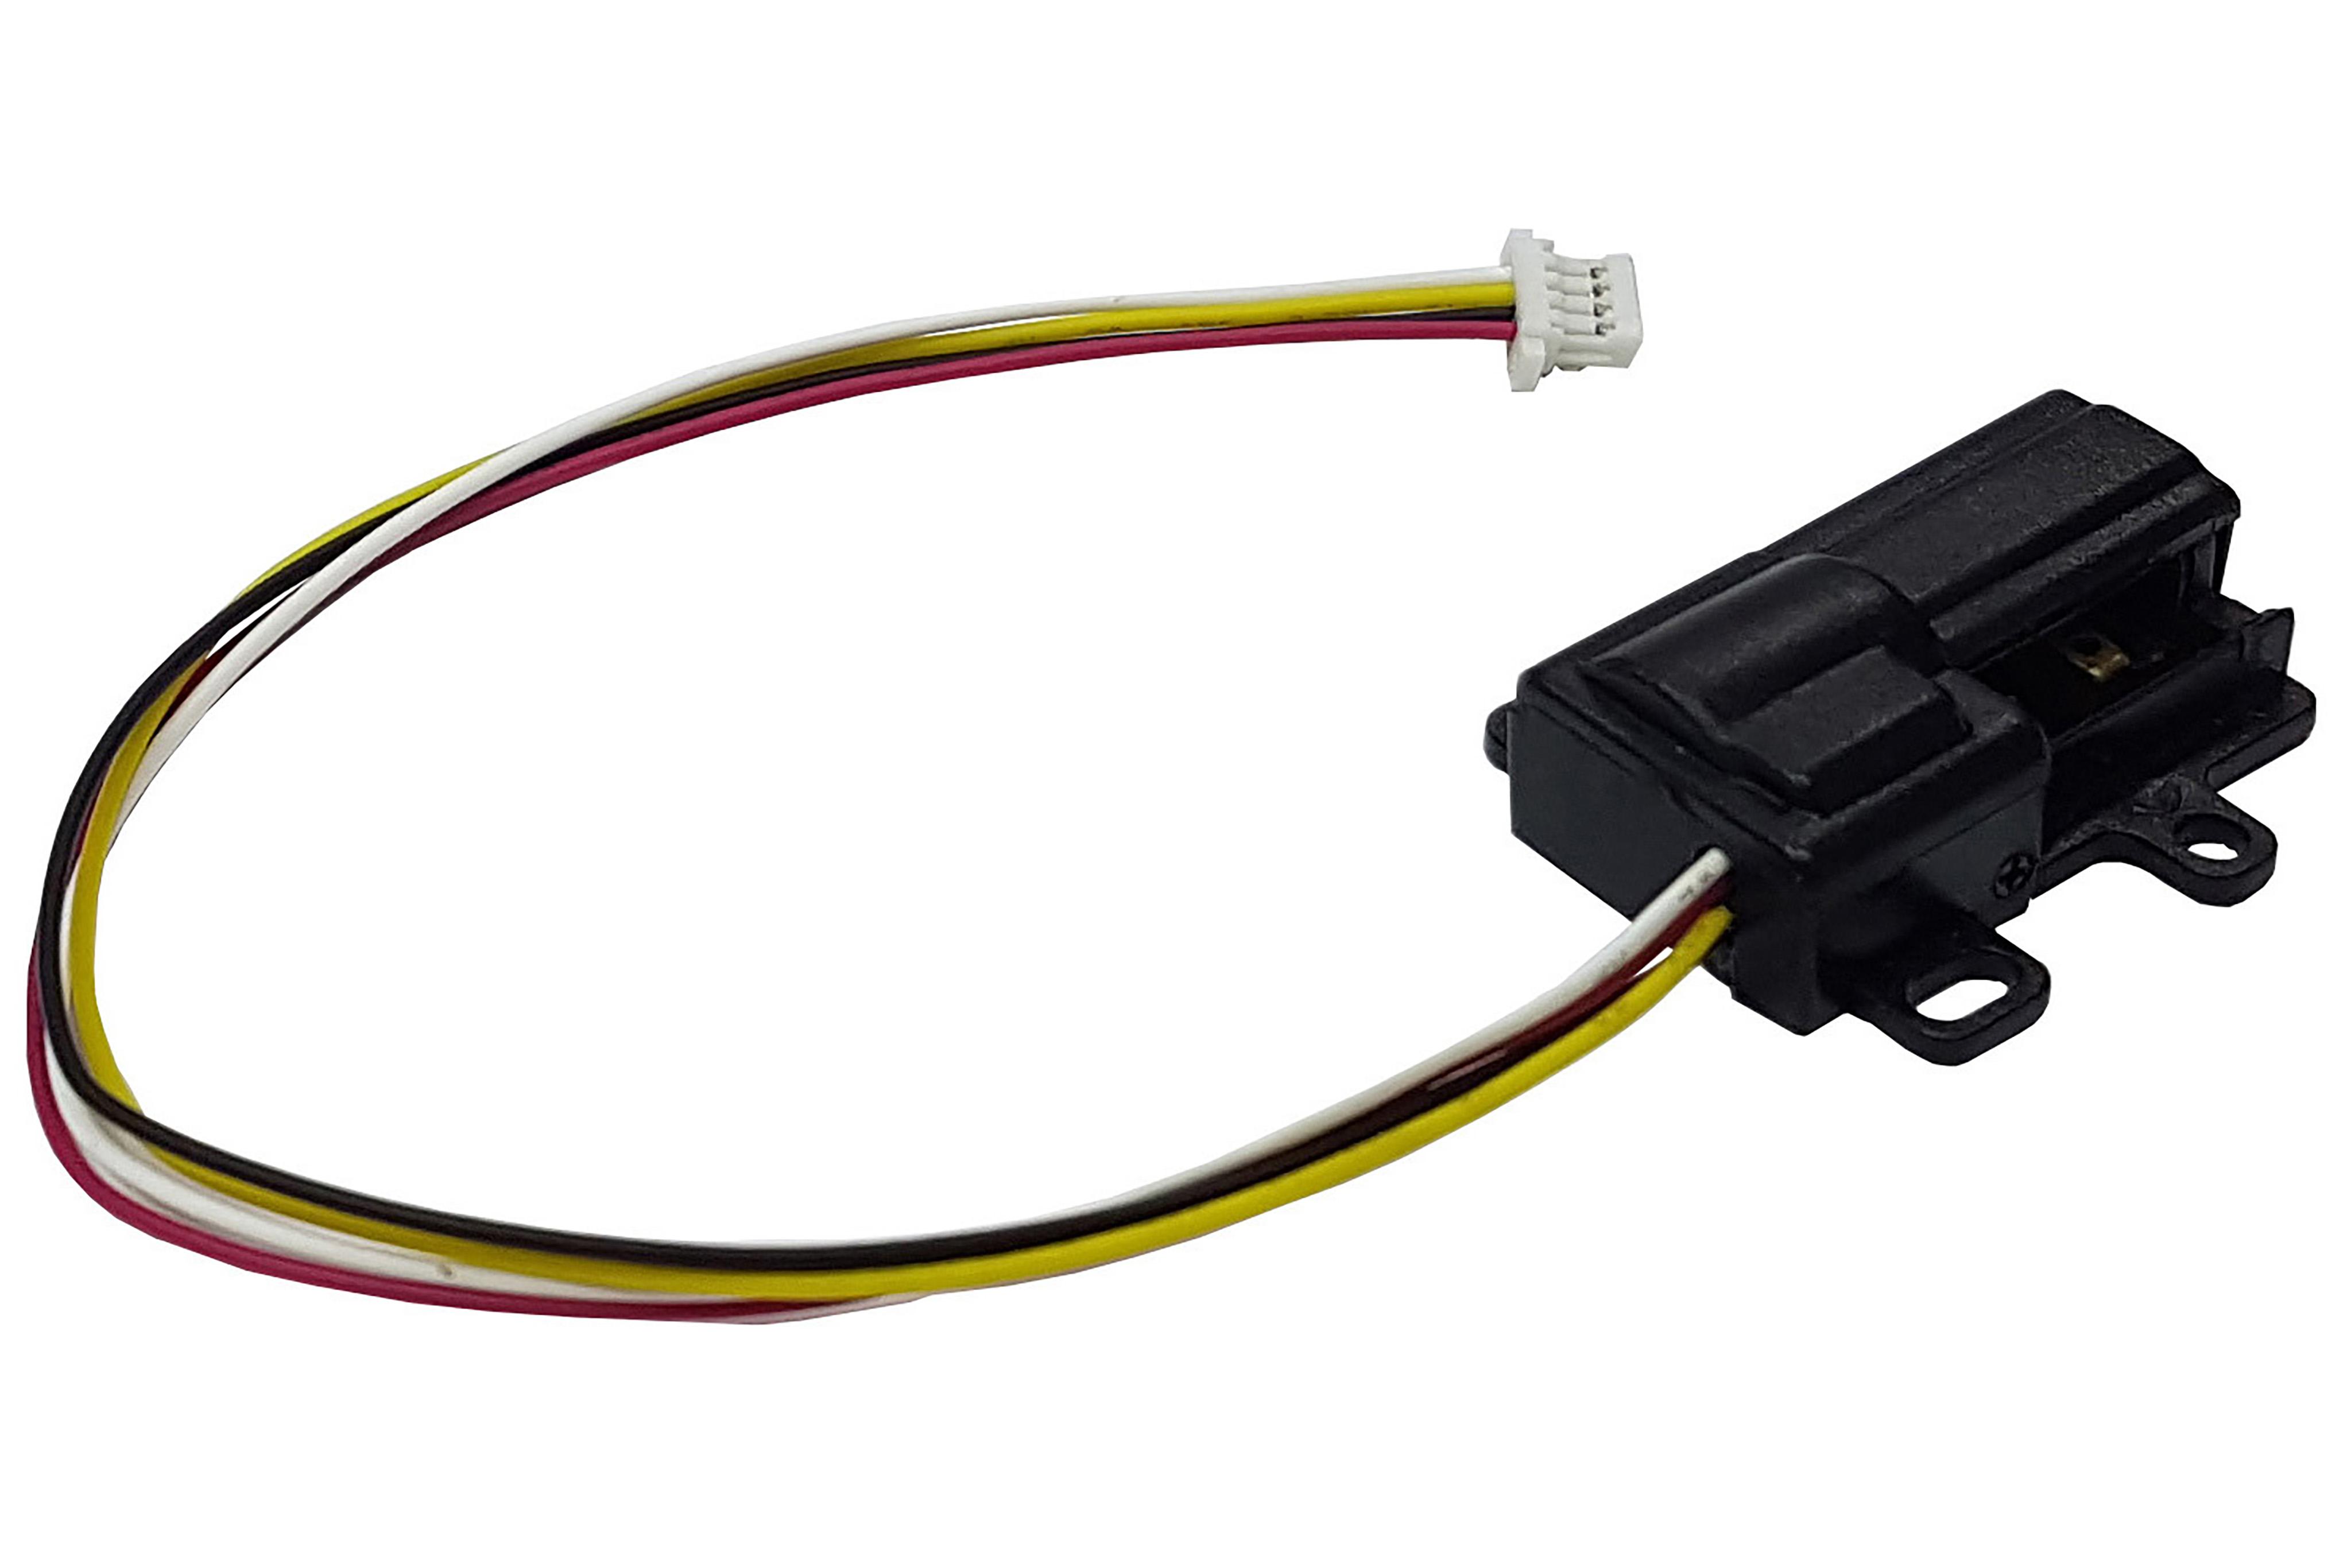 Cobalt Ss 6 Pack Wiring Ho Tracks For Storage